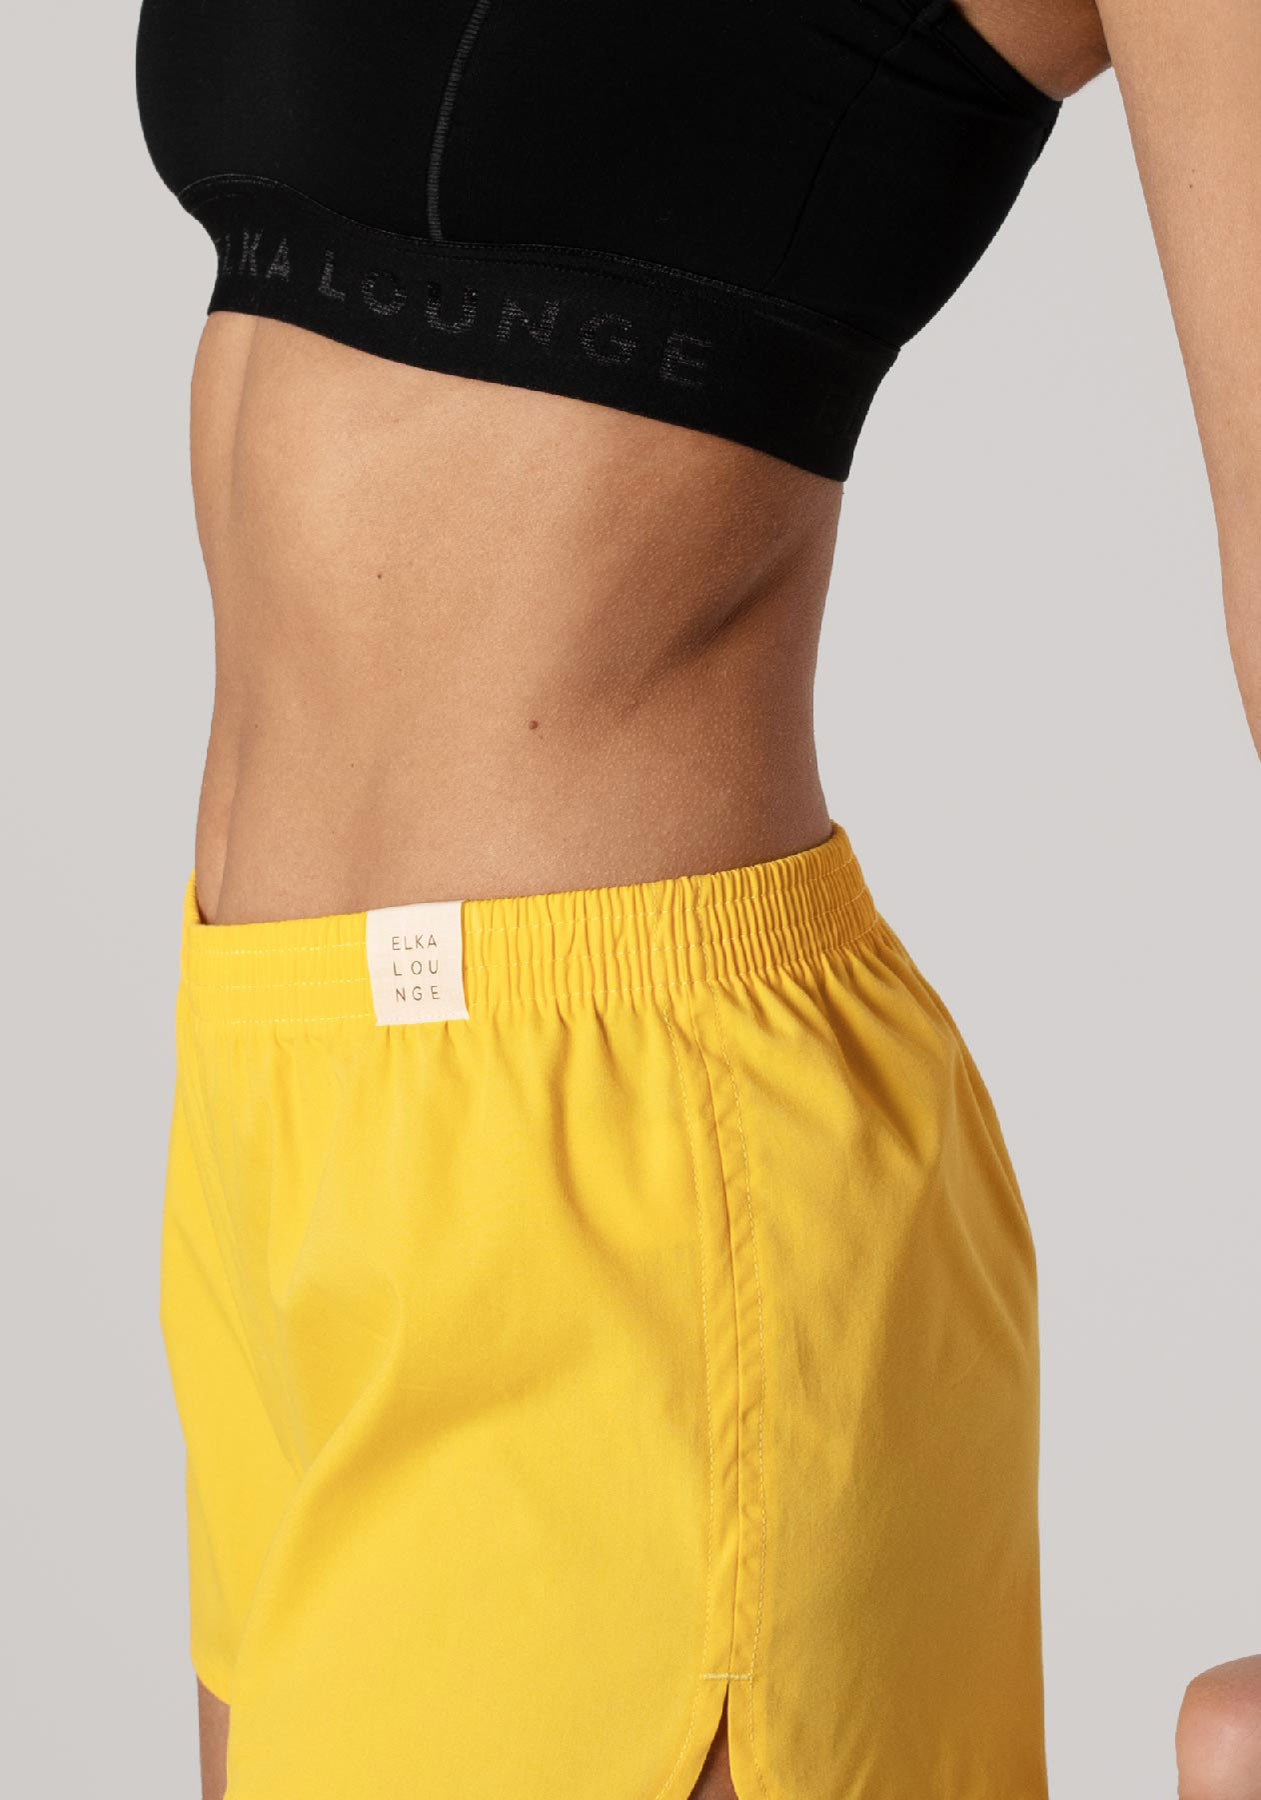 Women-Top,boxershorts-BackU-ELKA-Lounge-W00075,589